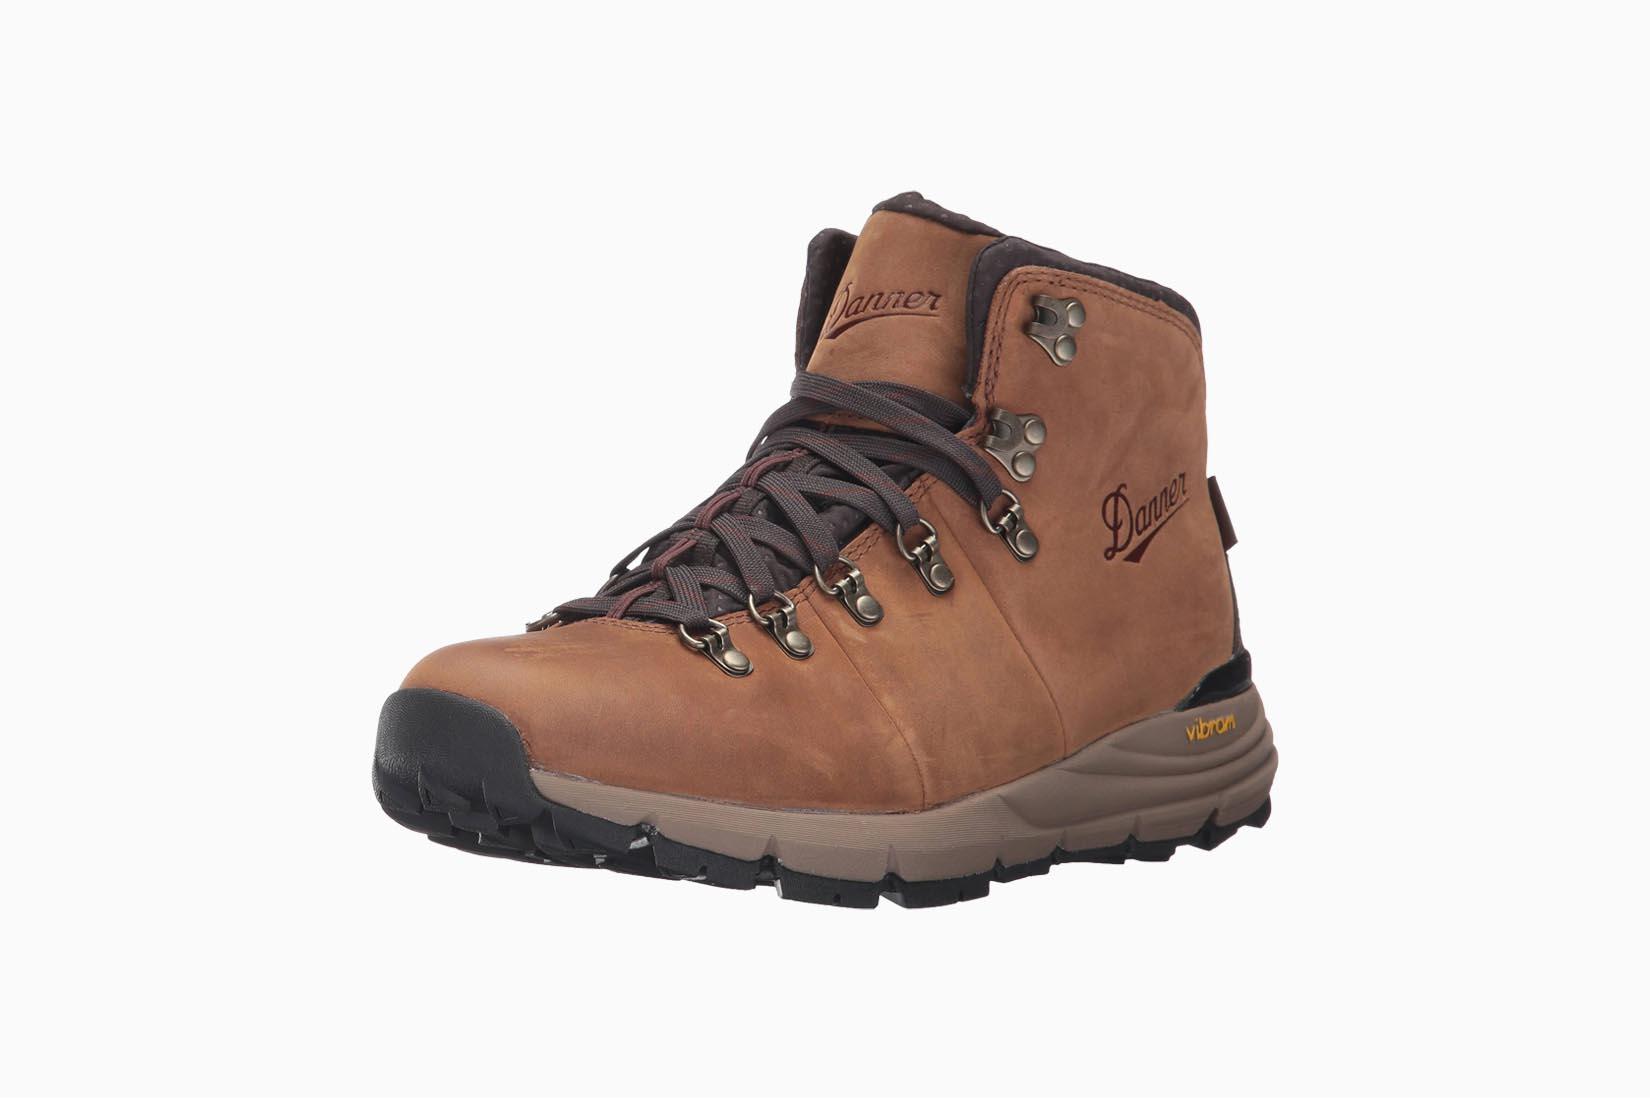 best boots men danner mens mountain hiking boots review Luxe Digital